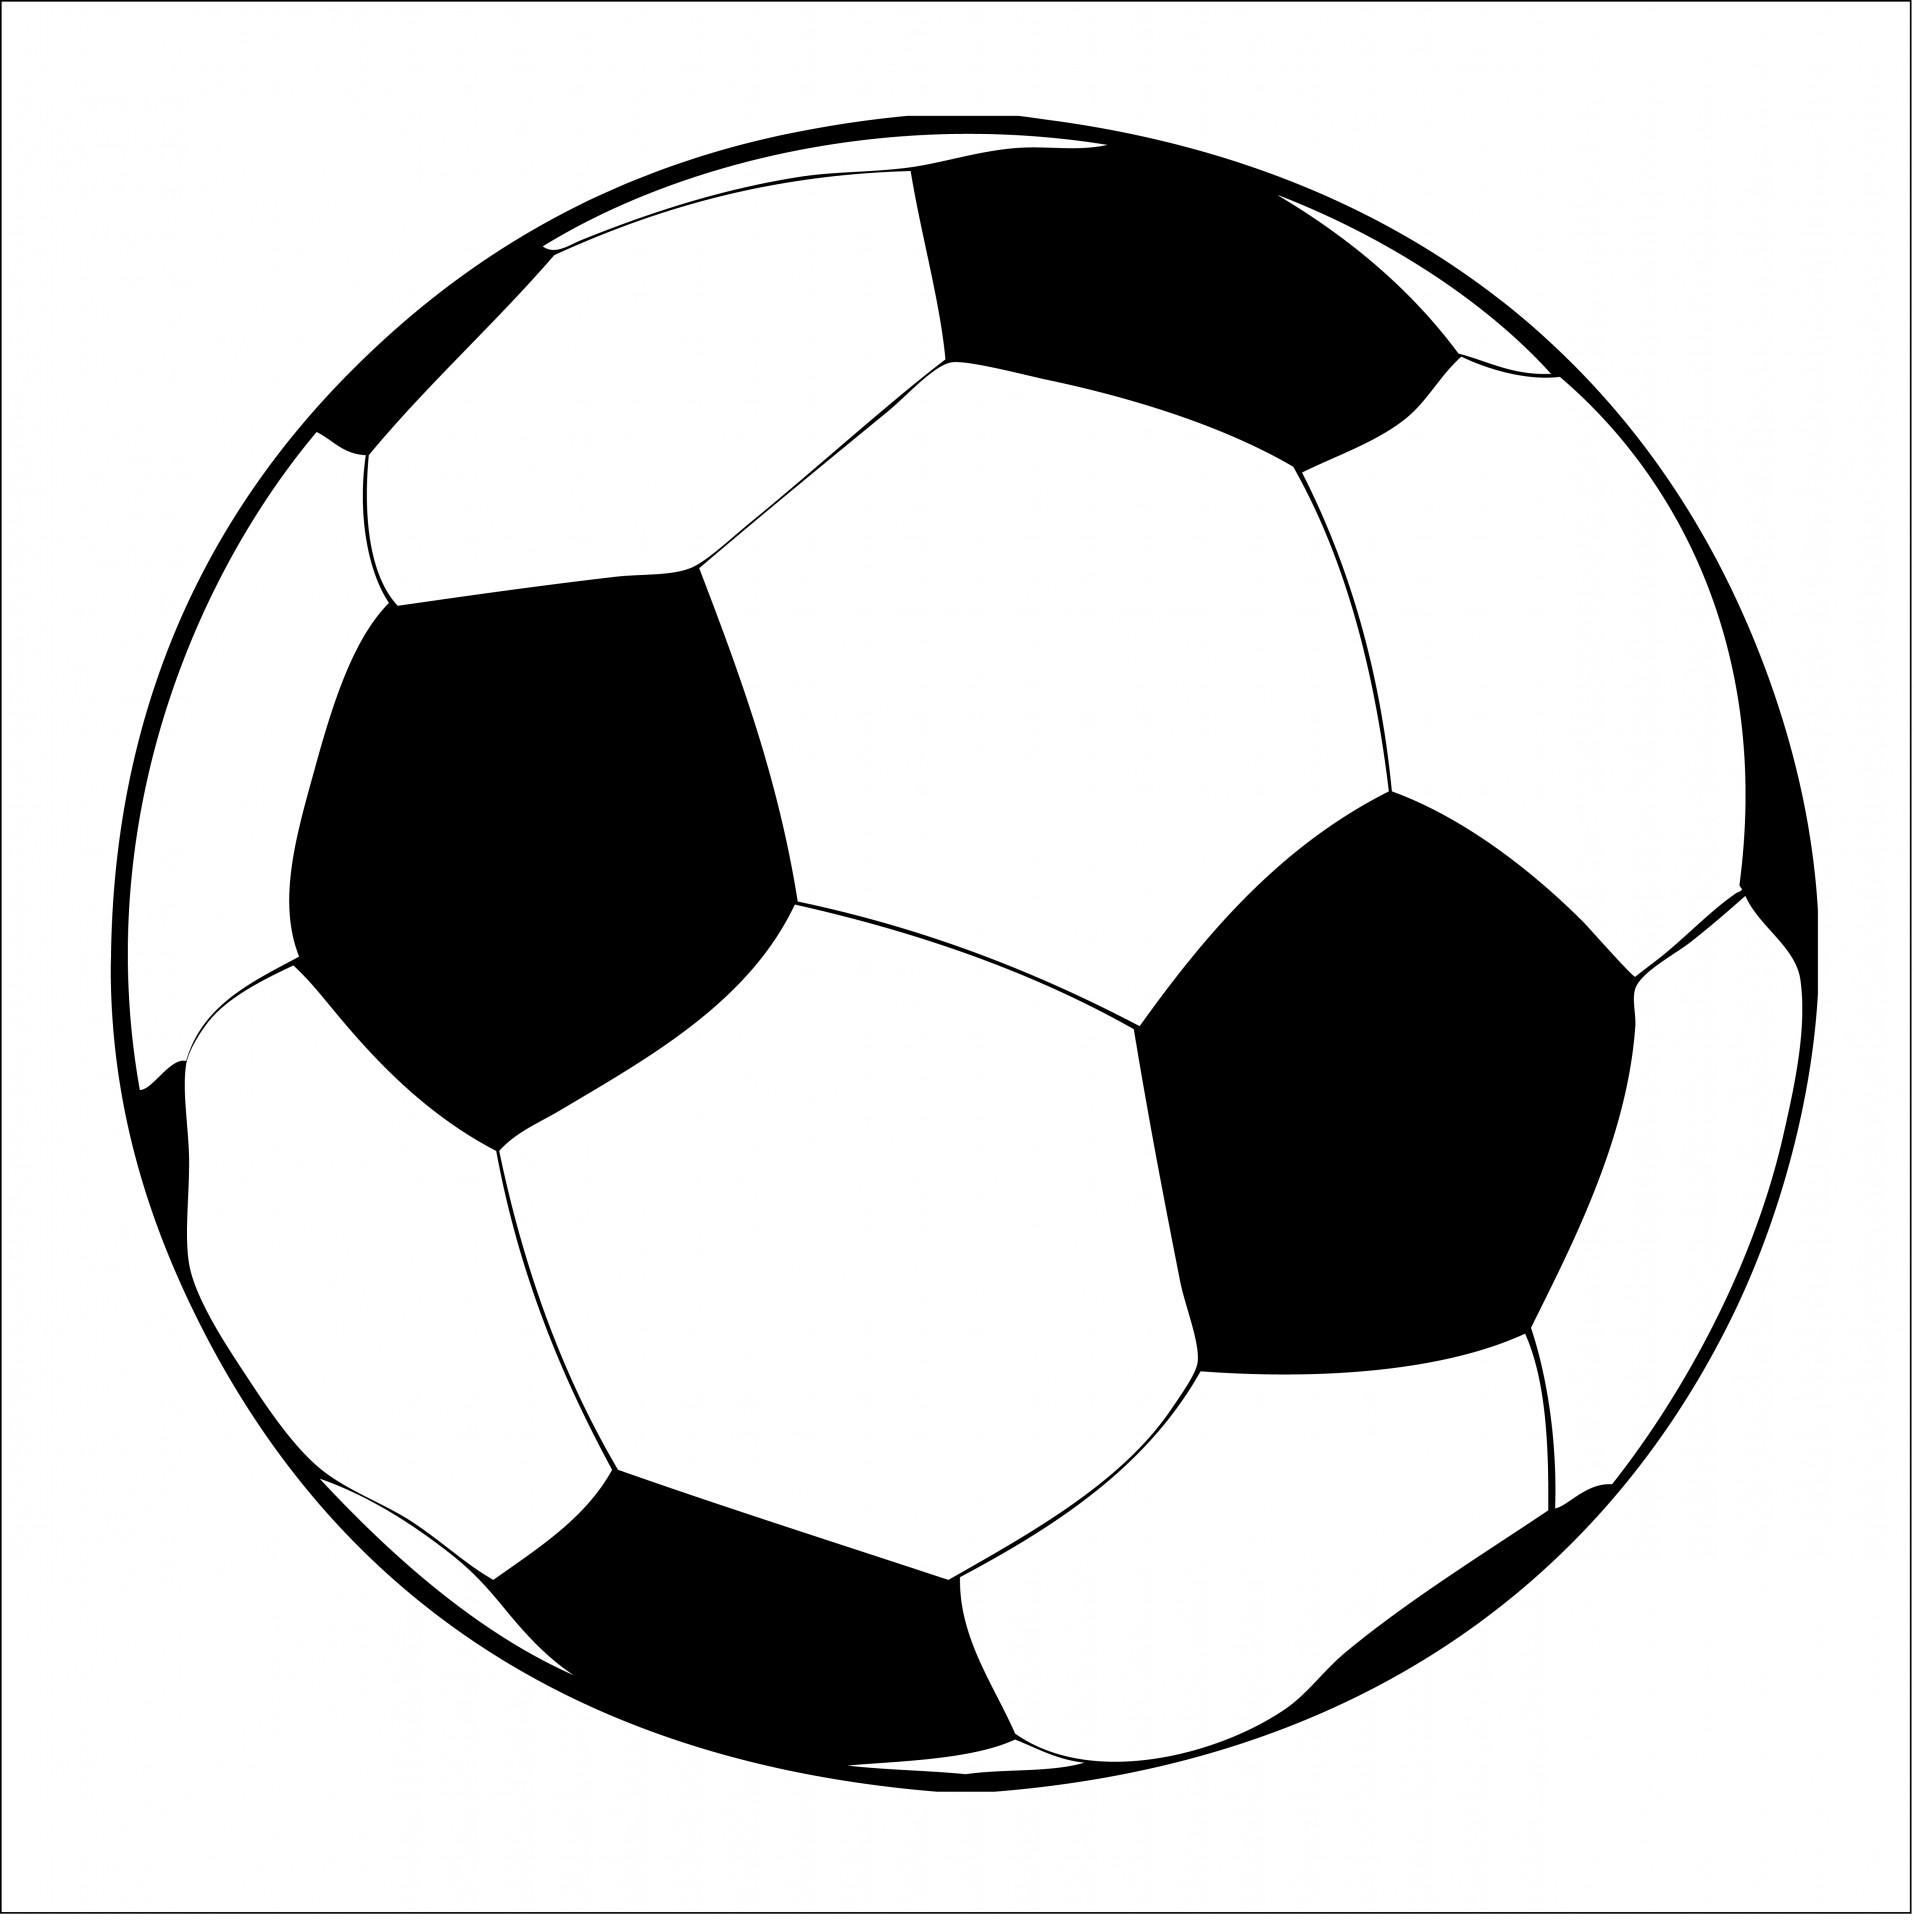 1914x1920 Clip Art Ball Images Clip Art